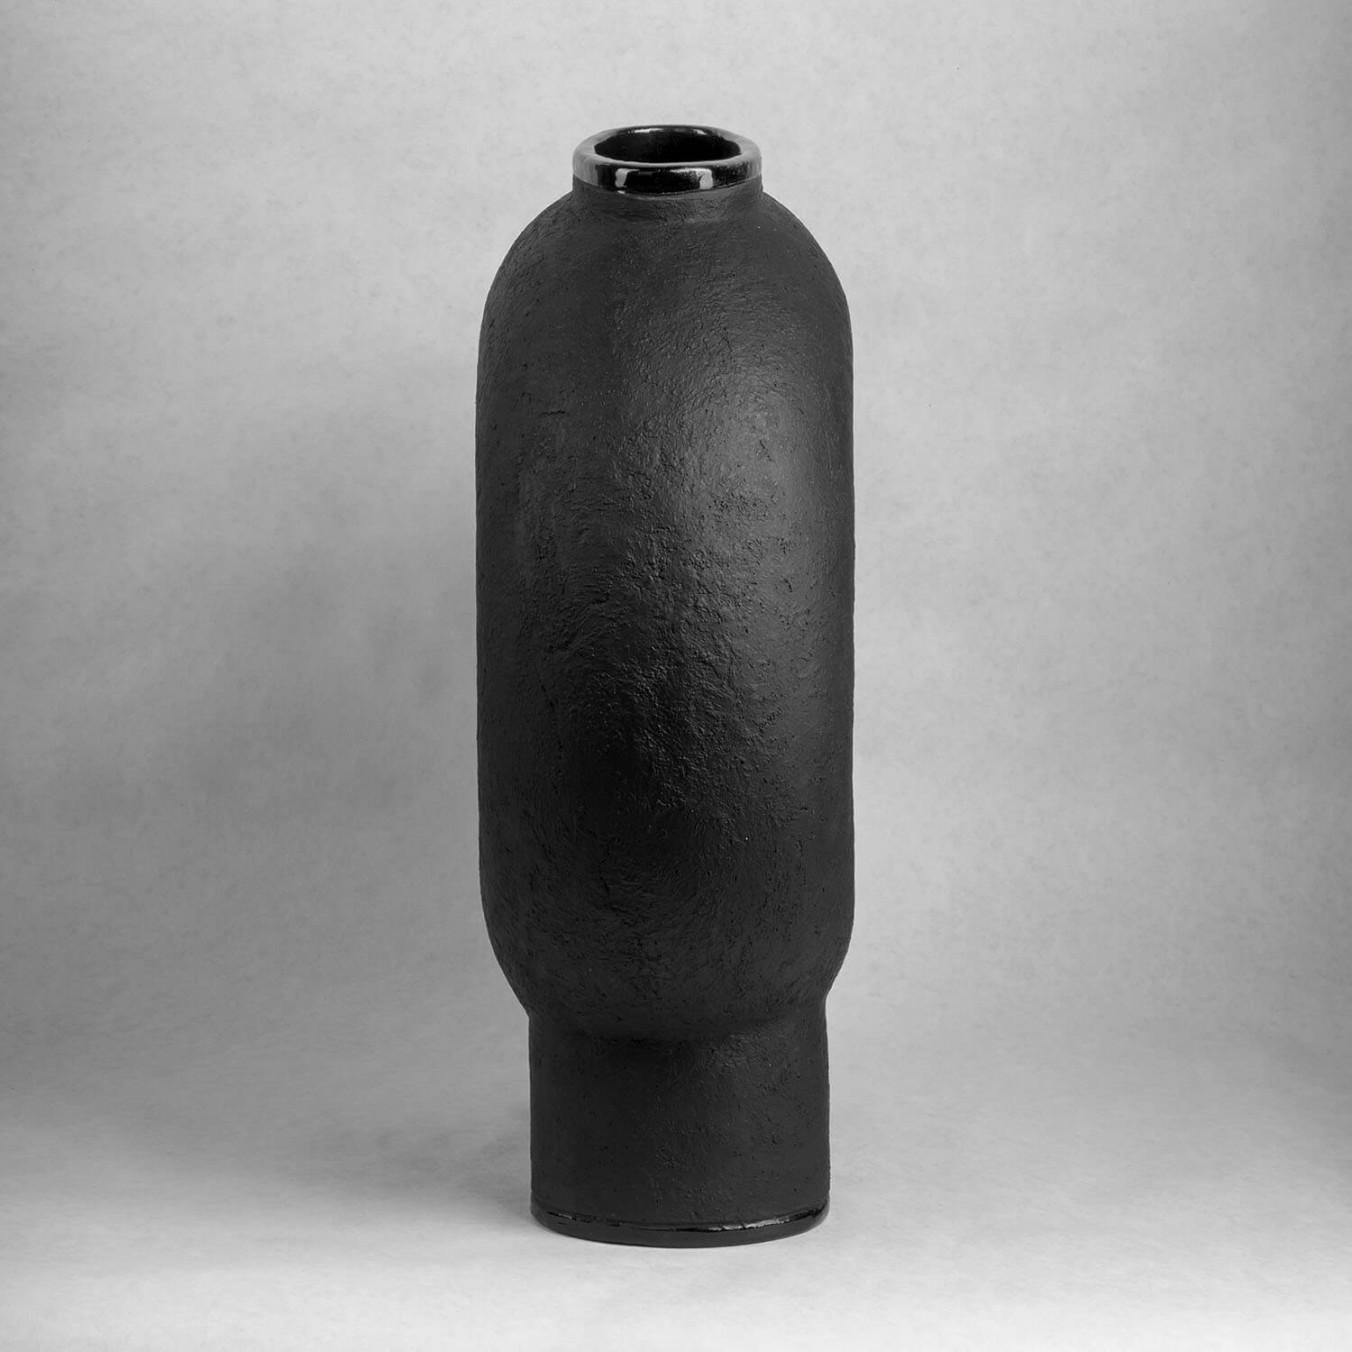 KUMANEC two legs vase